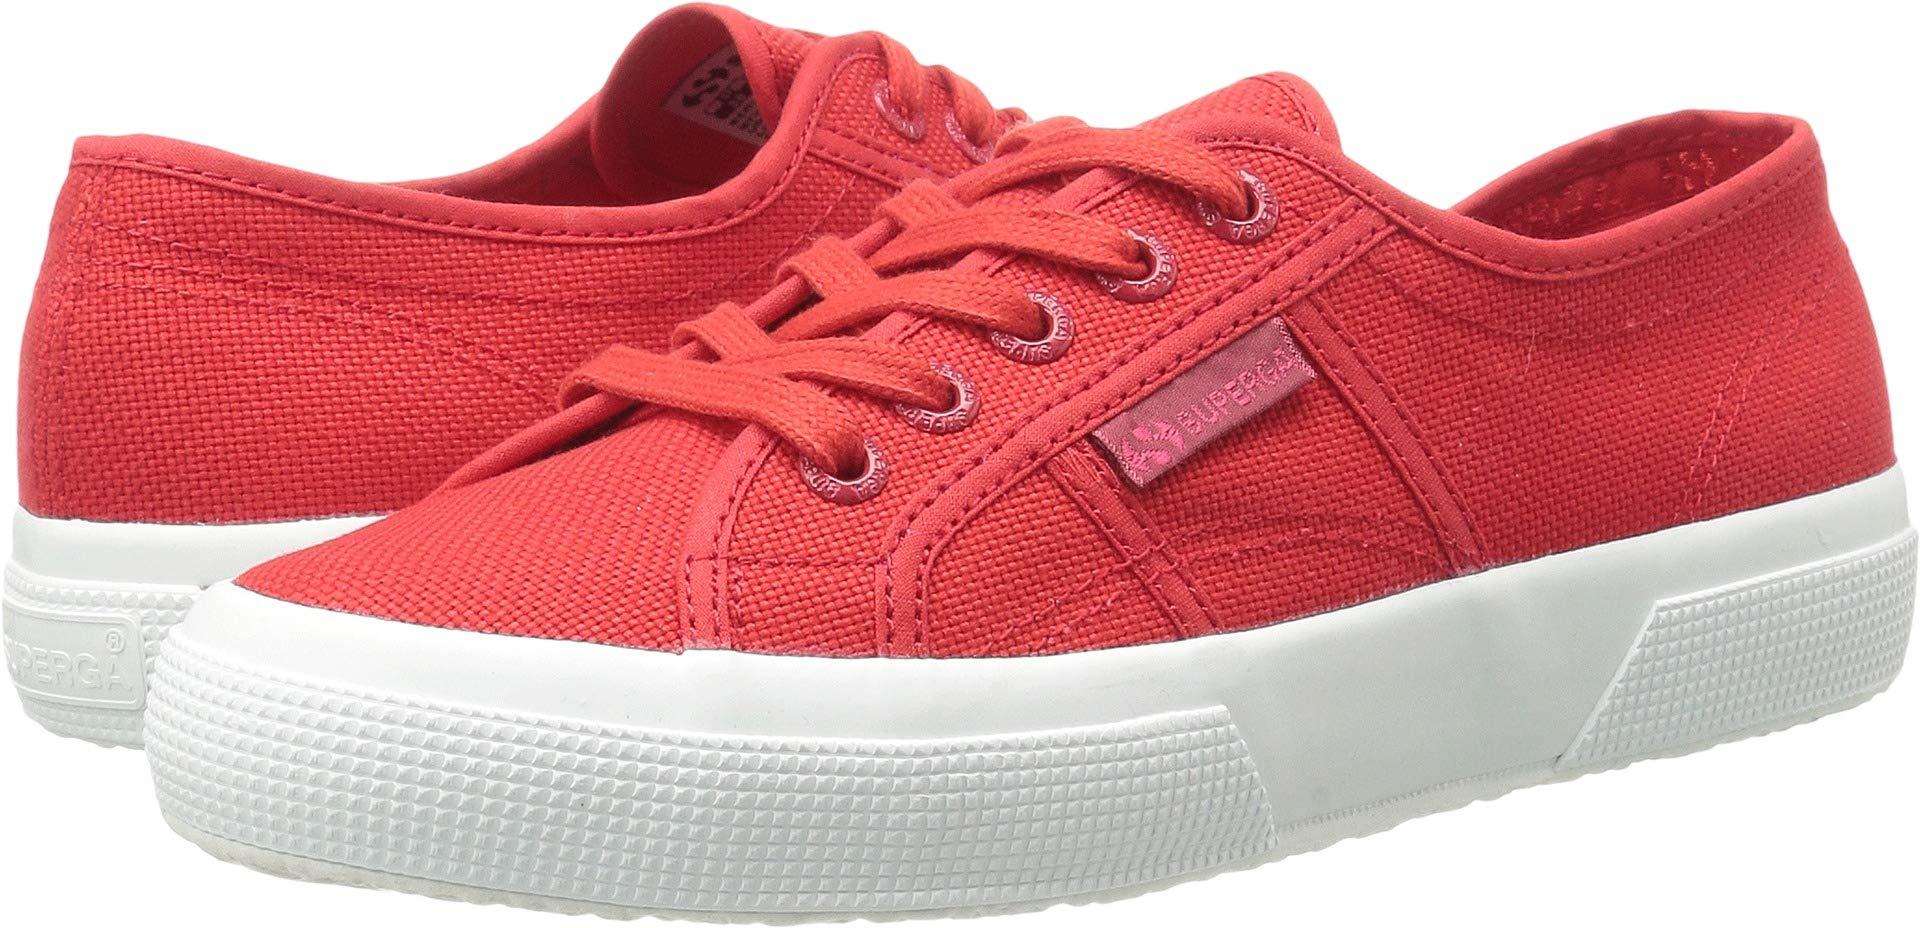 Superga Women's 2750 Cotu Sneaker, Red Full White, 38 M EU (7.5 US)